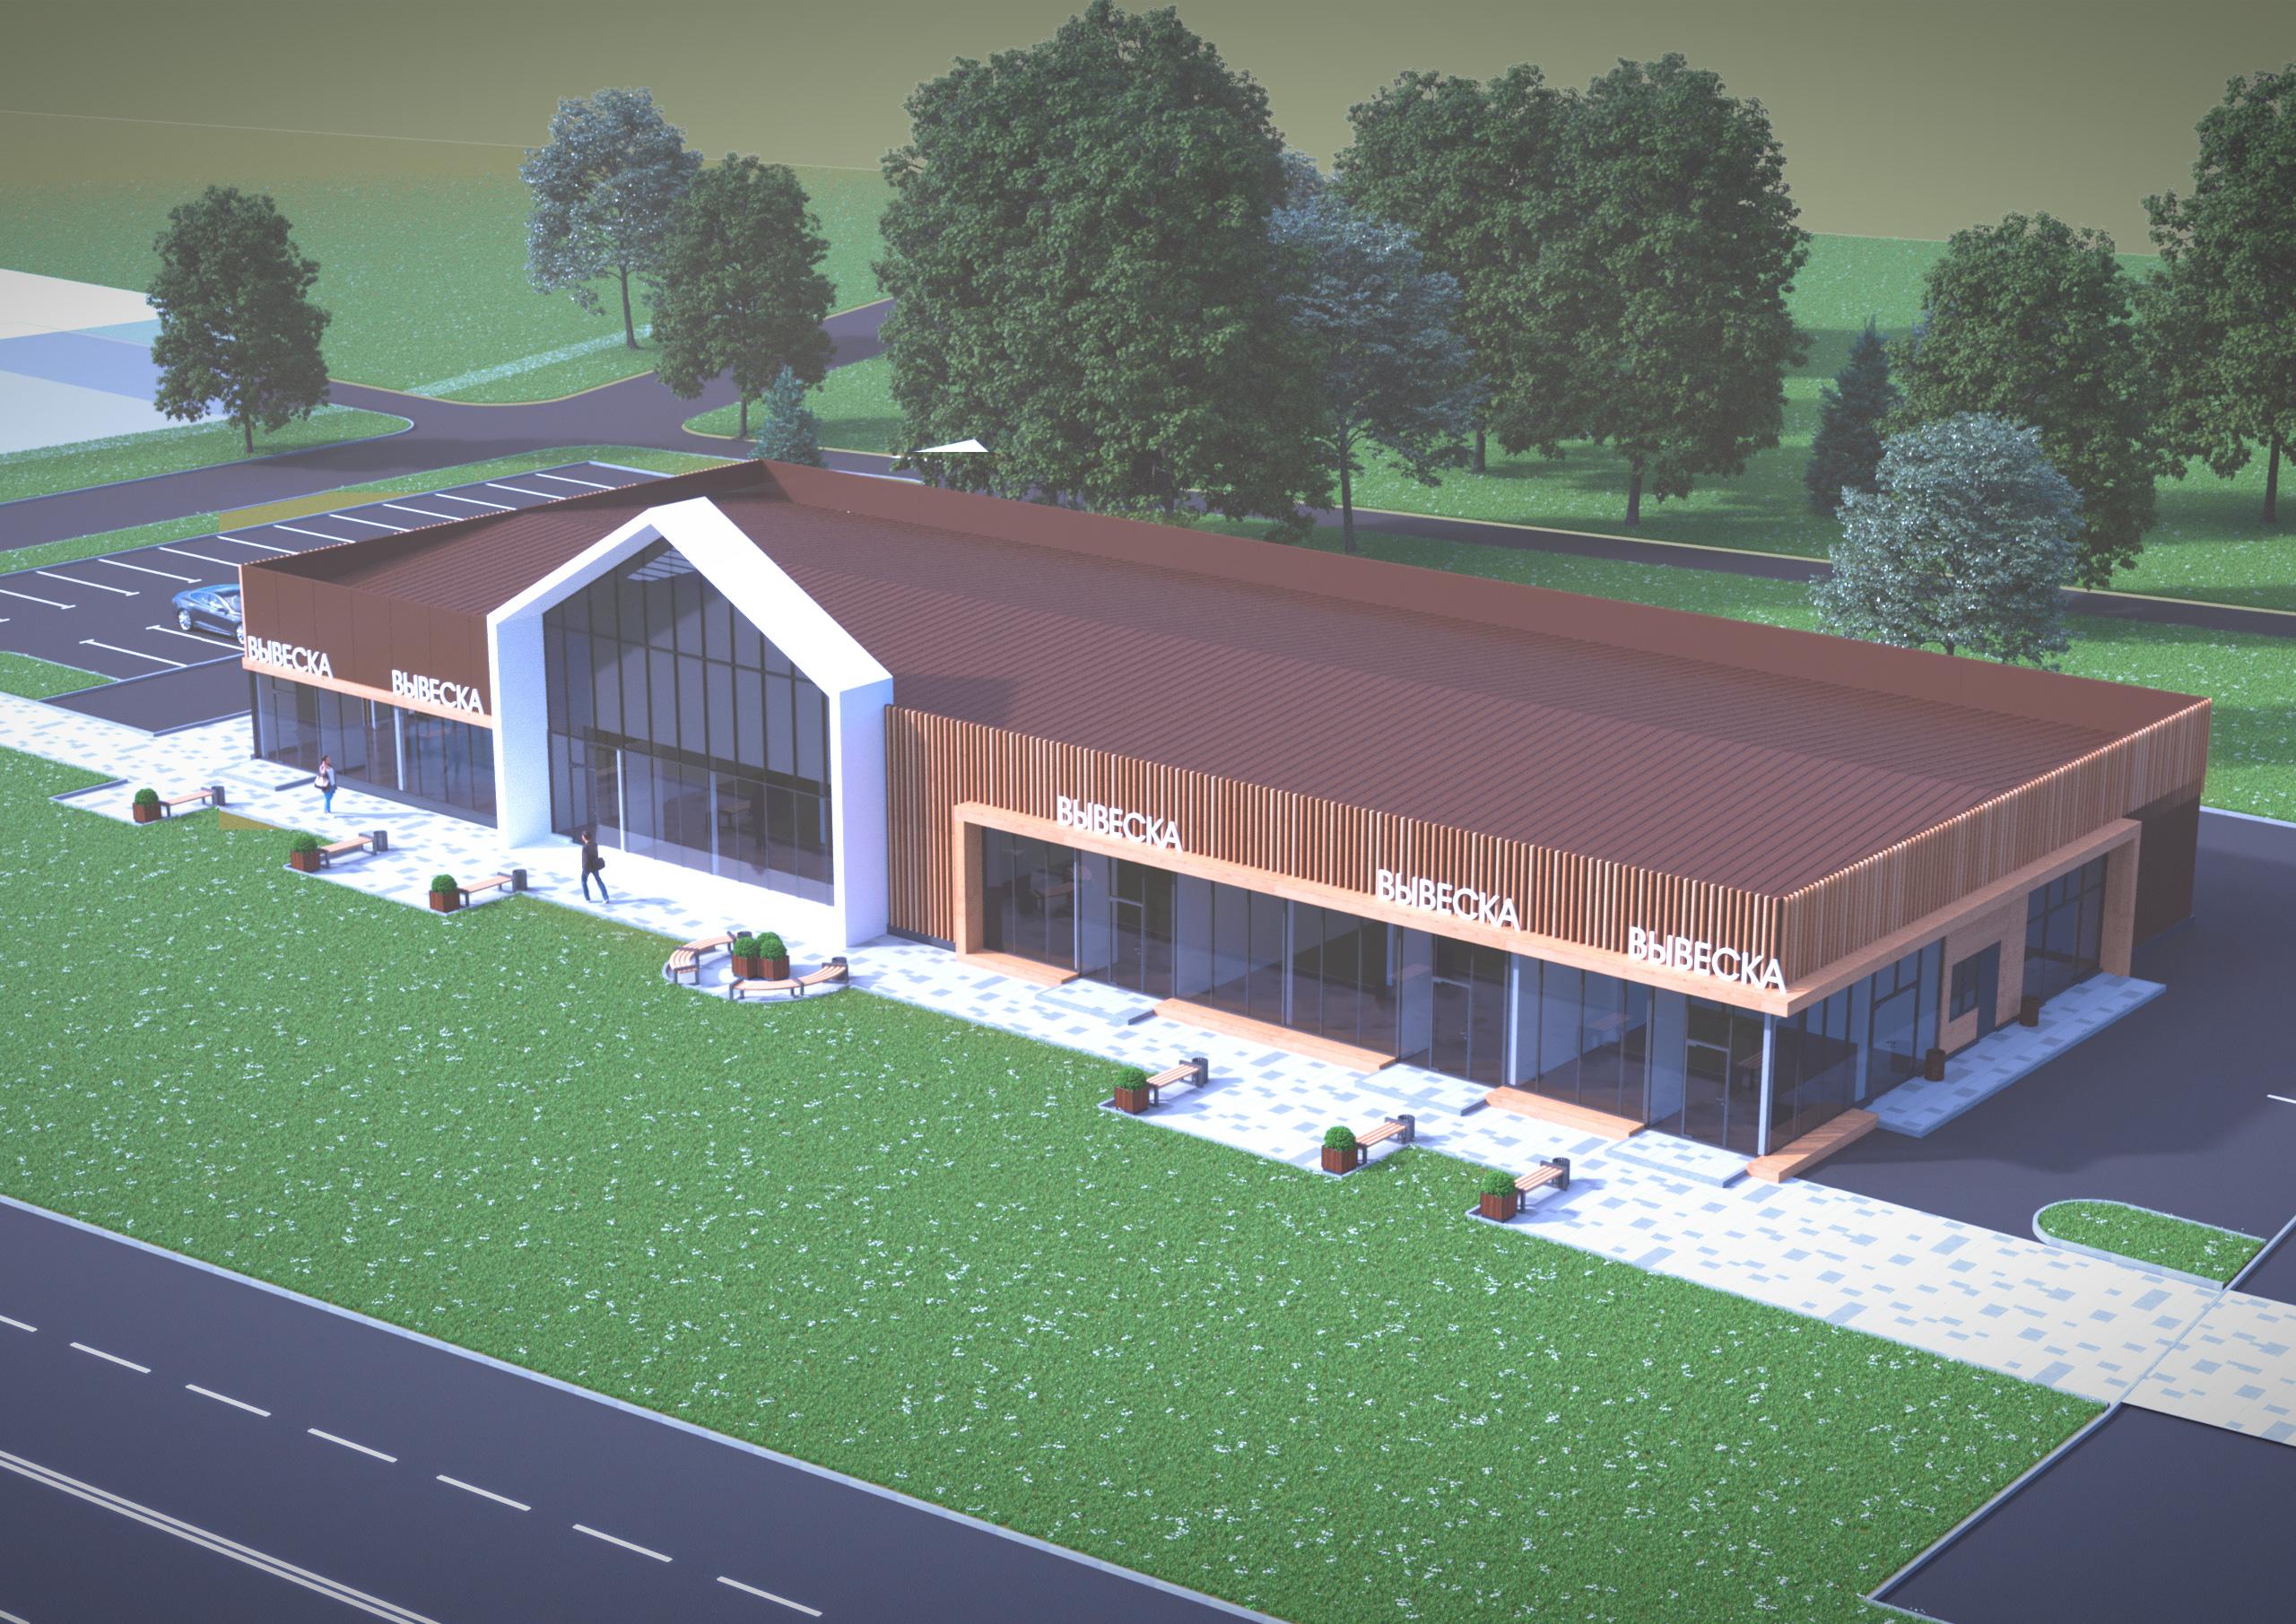 Общий вид здания гаражно-складского типа